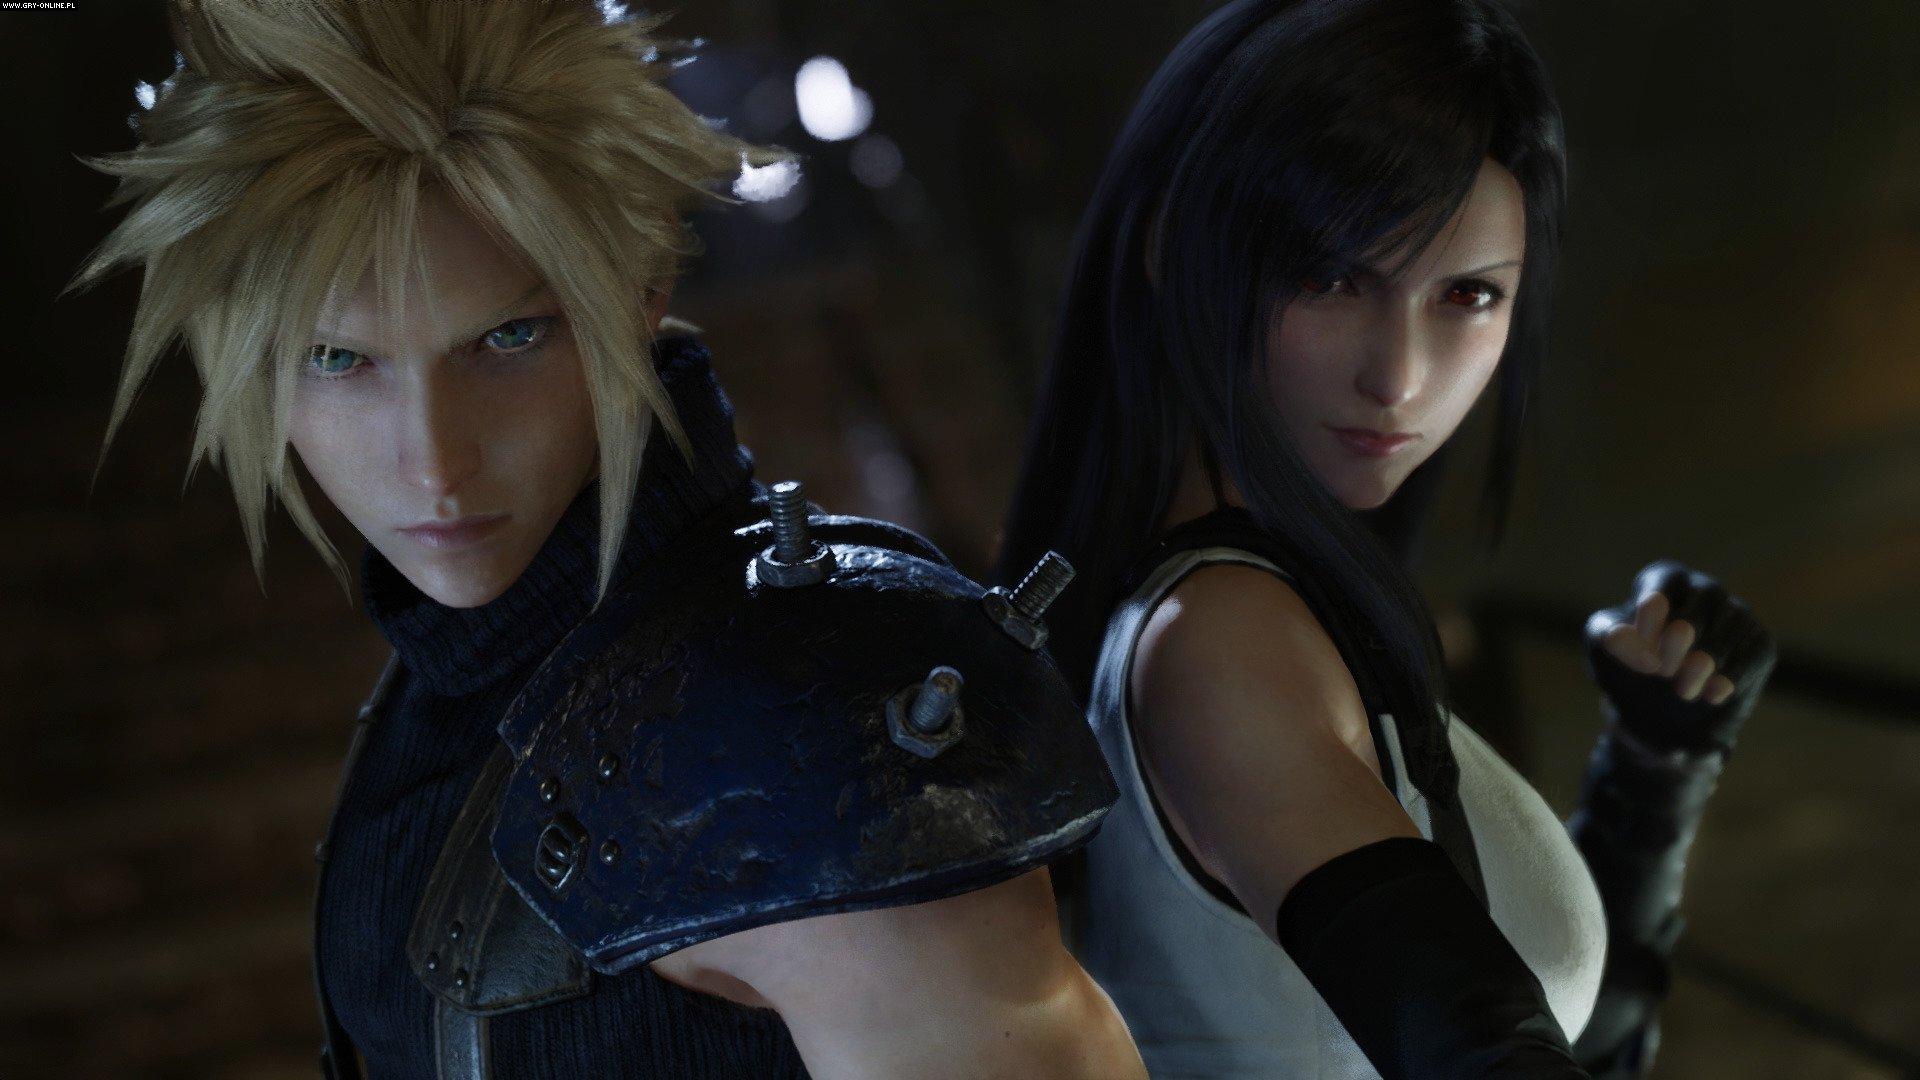 Final Fantasy VII Remake PS4 Games Image 18/28, Square-Enix / Eidos